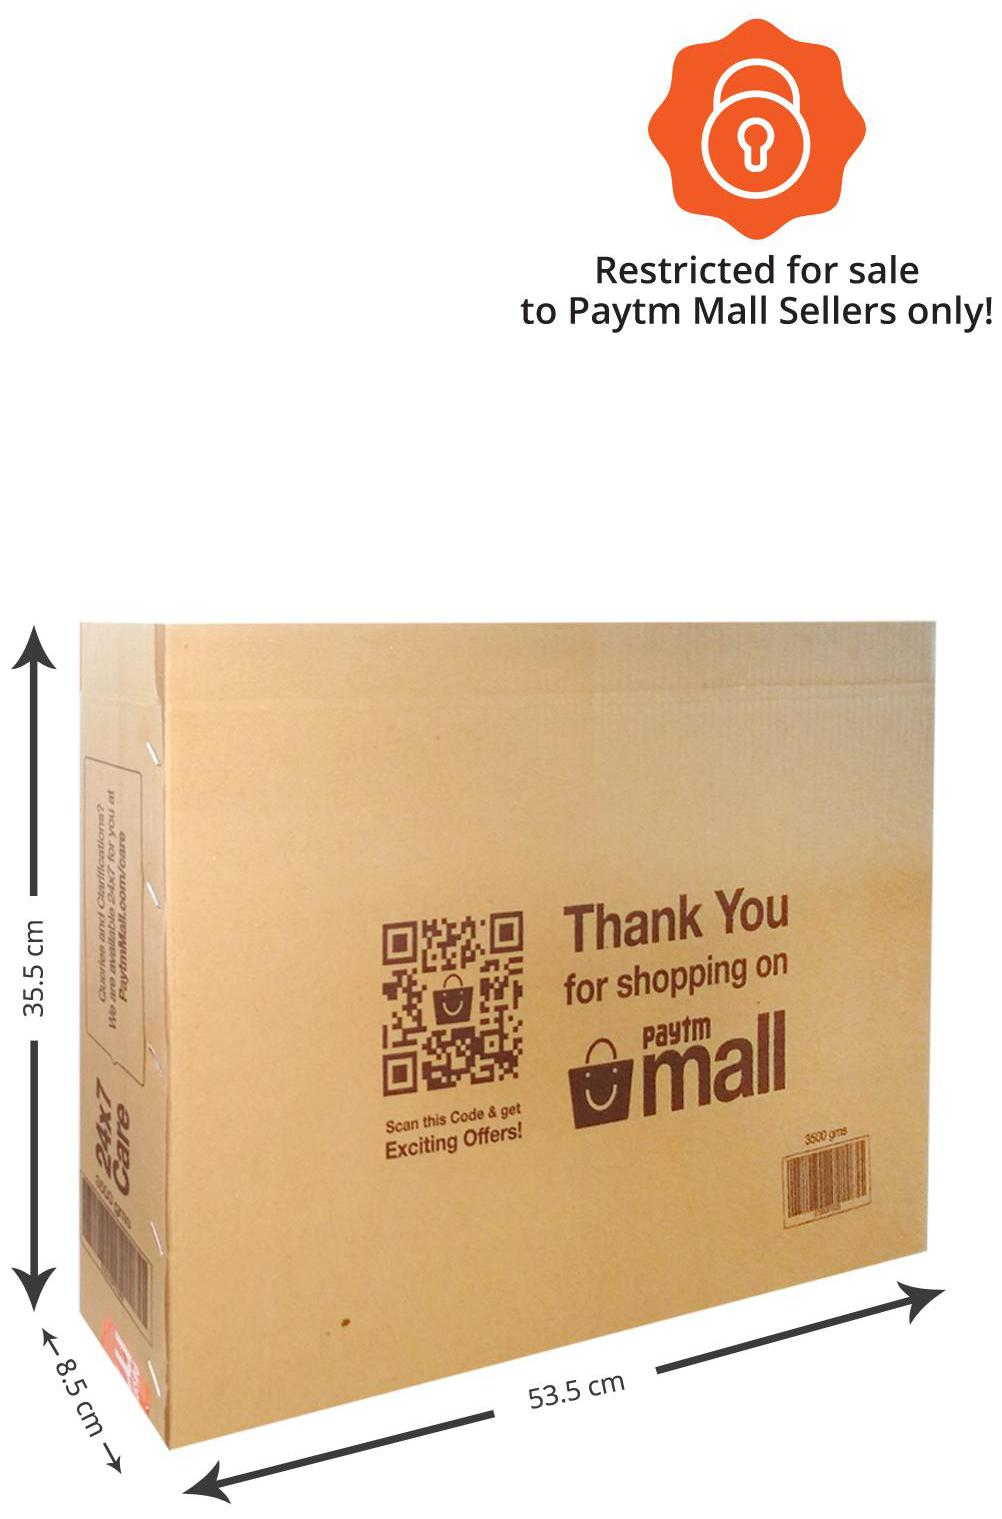 https://assetscdn1.paytm.com/images/catalog/product/F/FU/FUL3500-GMS-PT0MERC9505688361F0F5/1585837816056_0.jpg